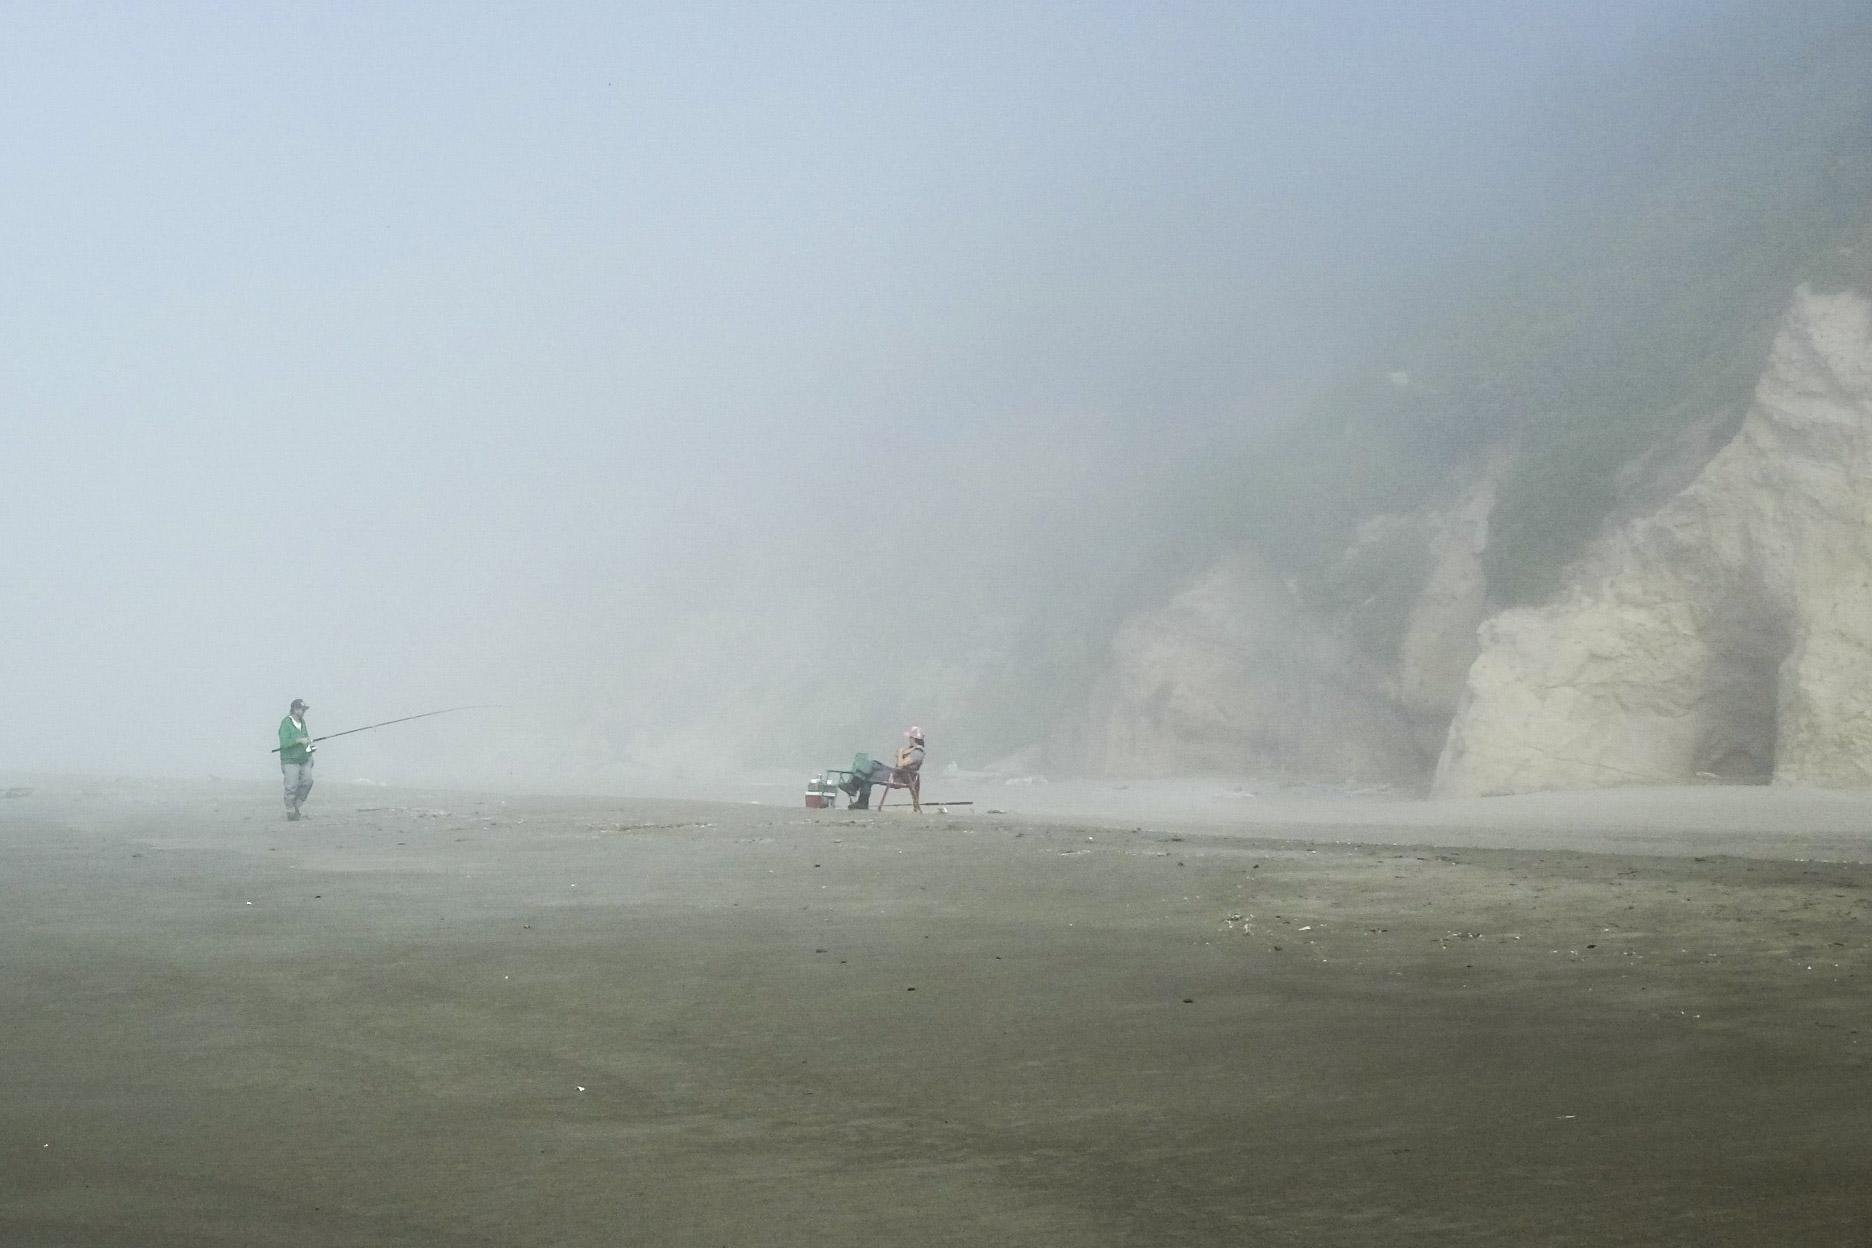 Black-Bear-Brand-Tilley-Surfboards-Water-Testing-03.jpg